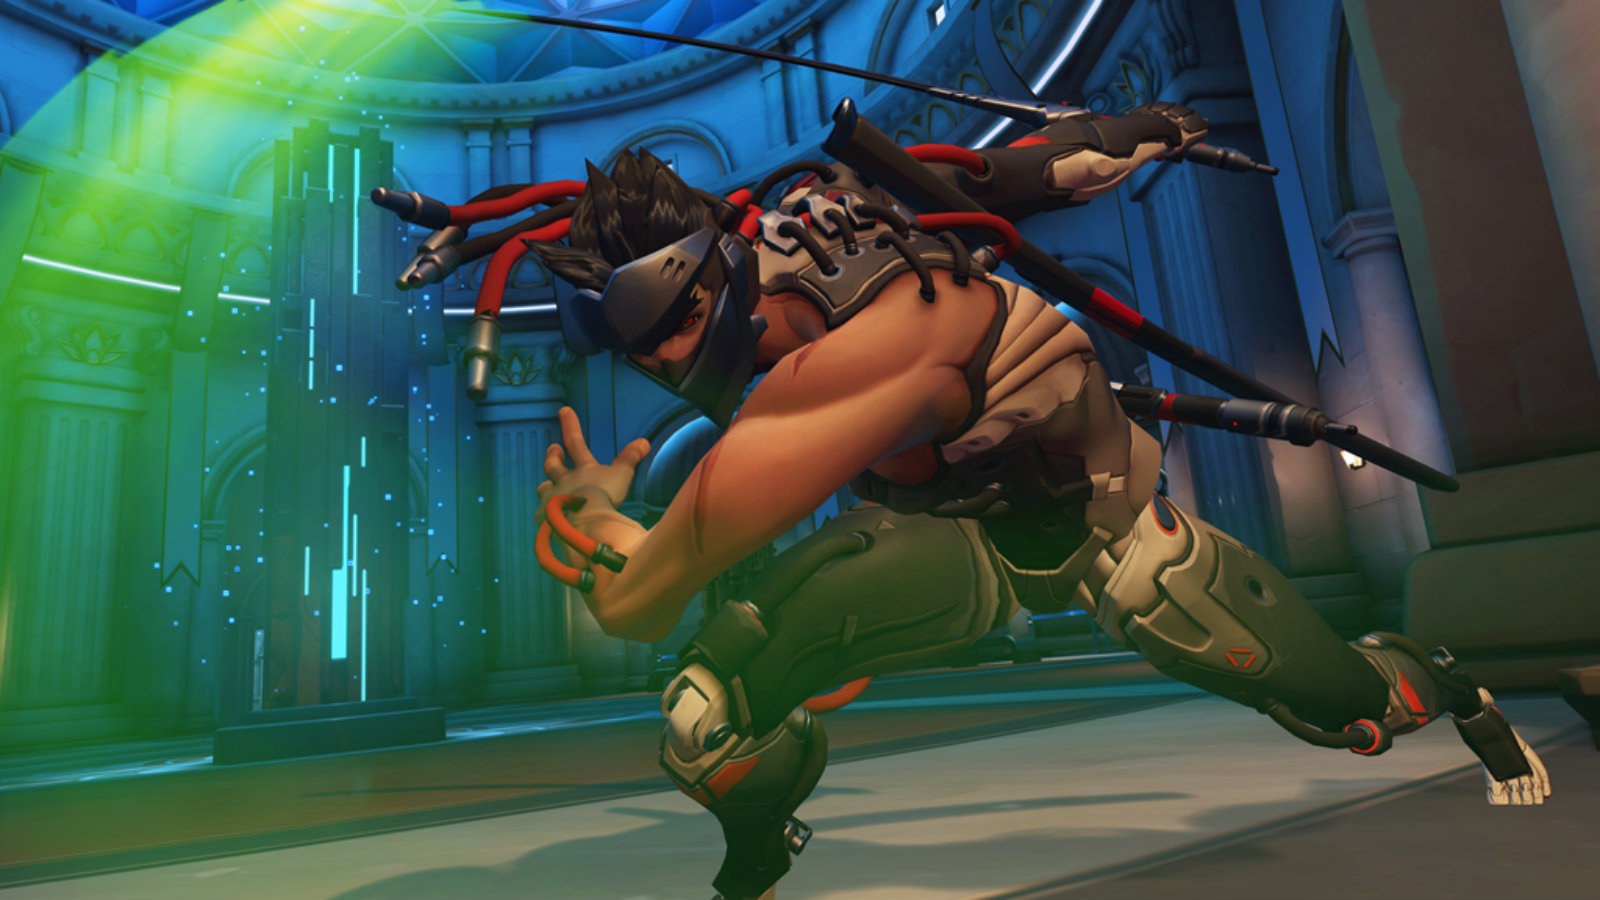 Genji attacks with blade